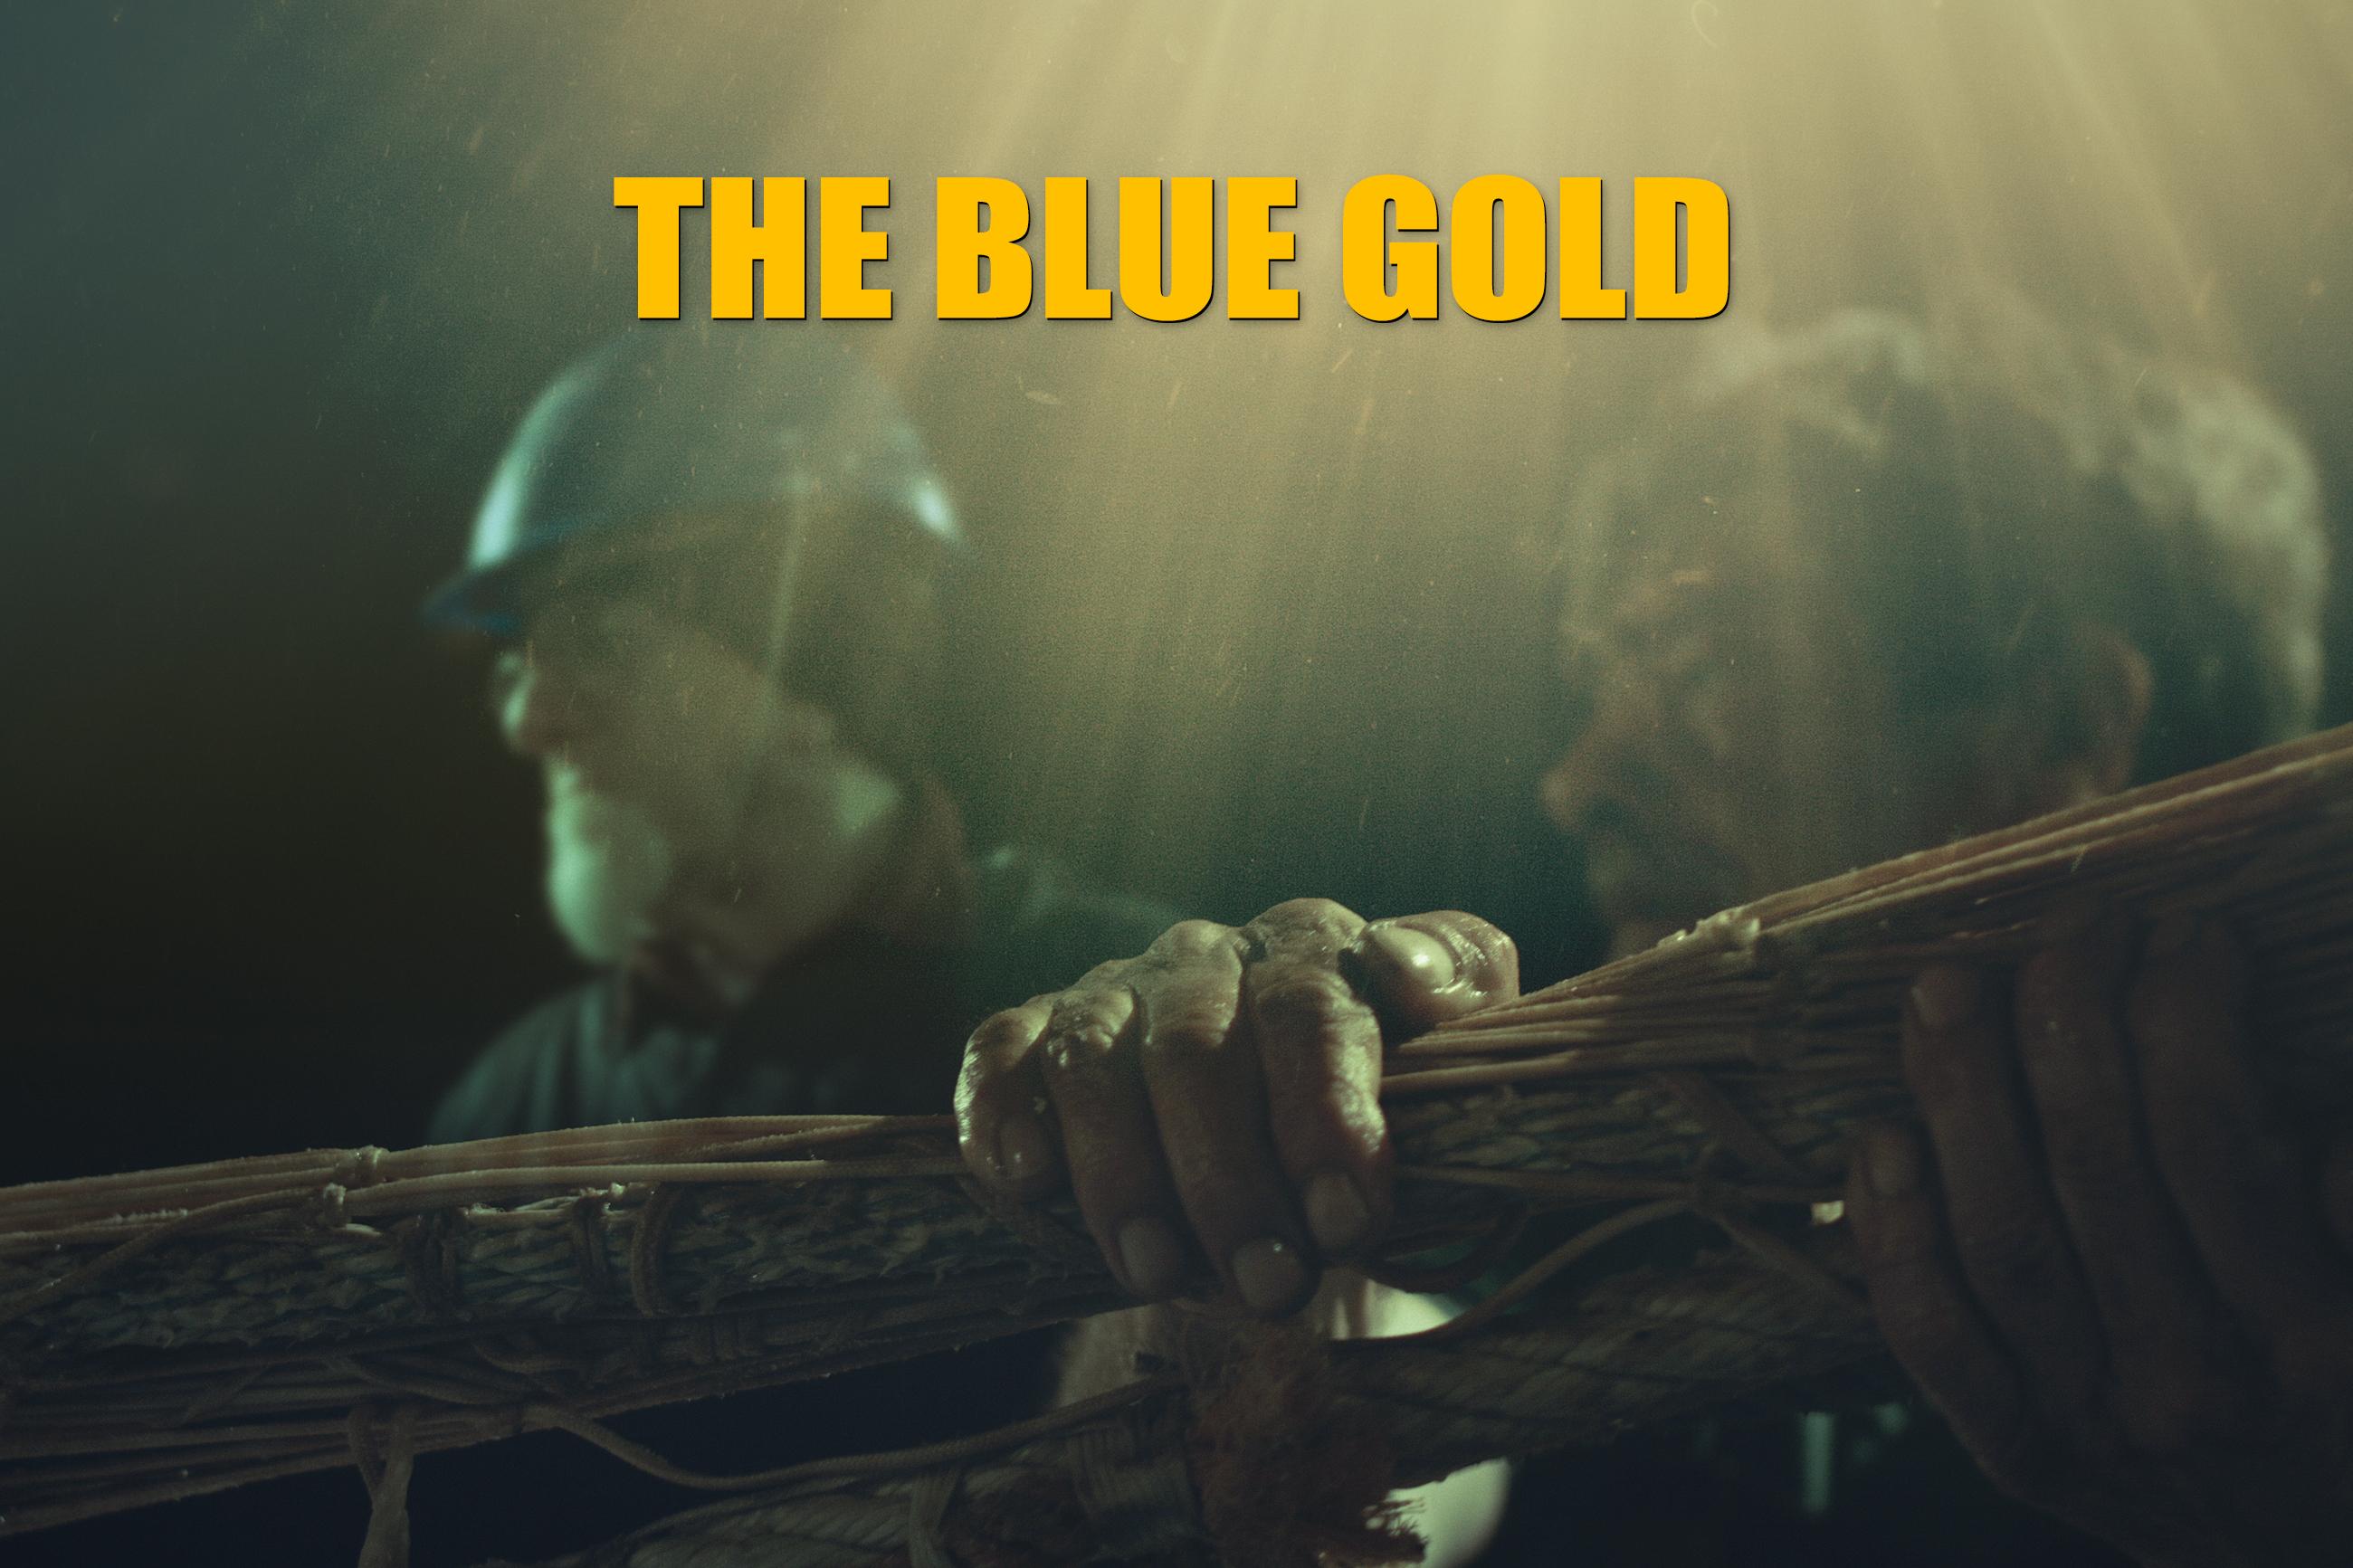 the_blue_gold_documentary_cnr_ismar_finship_by_flavio_oliva_01